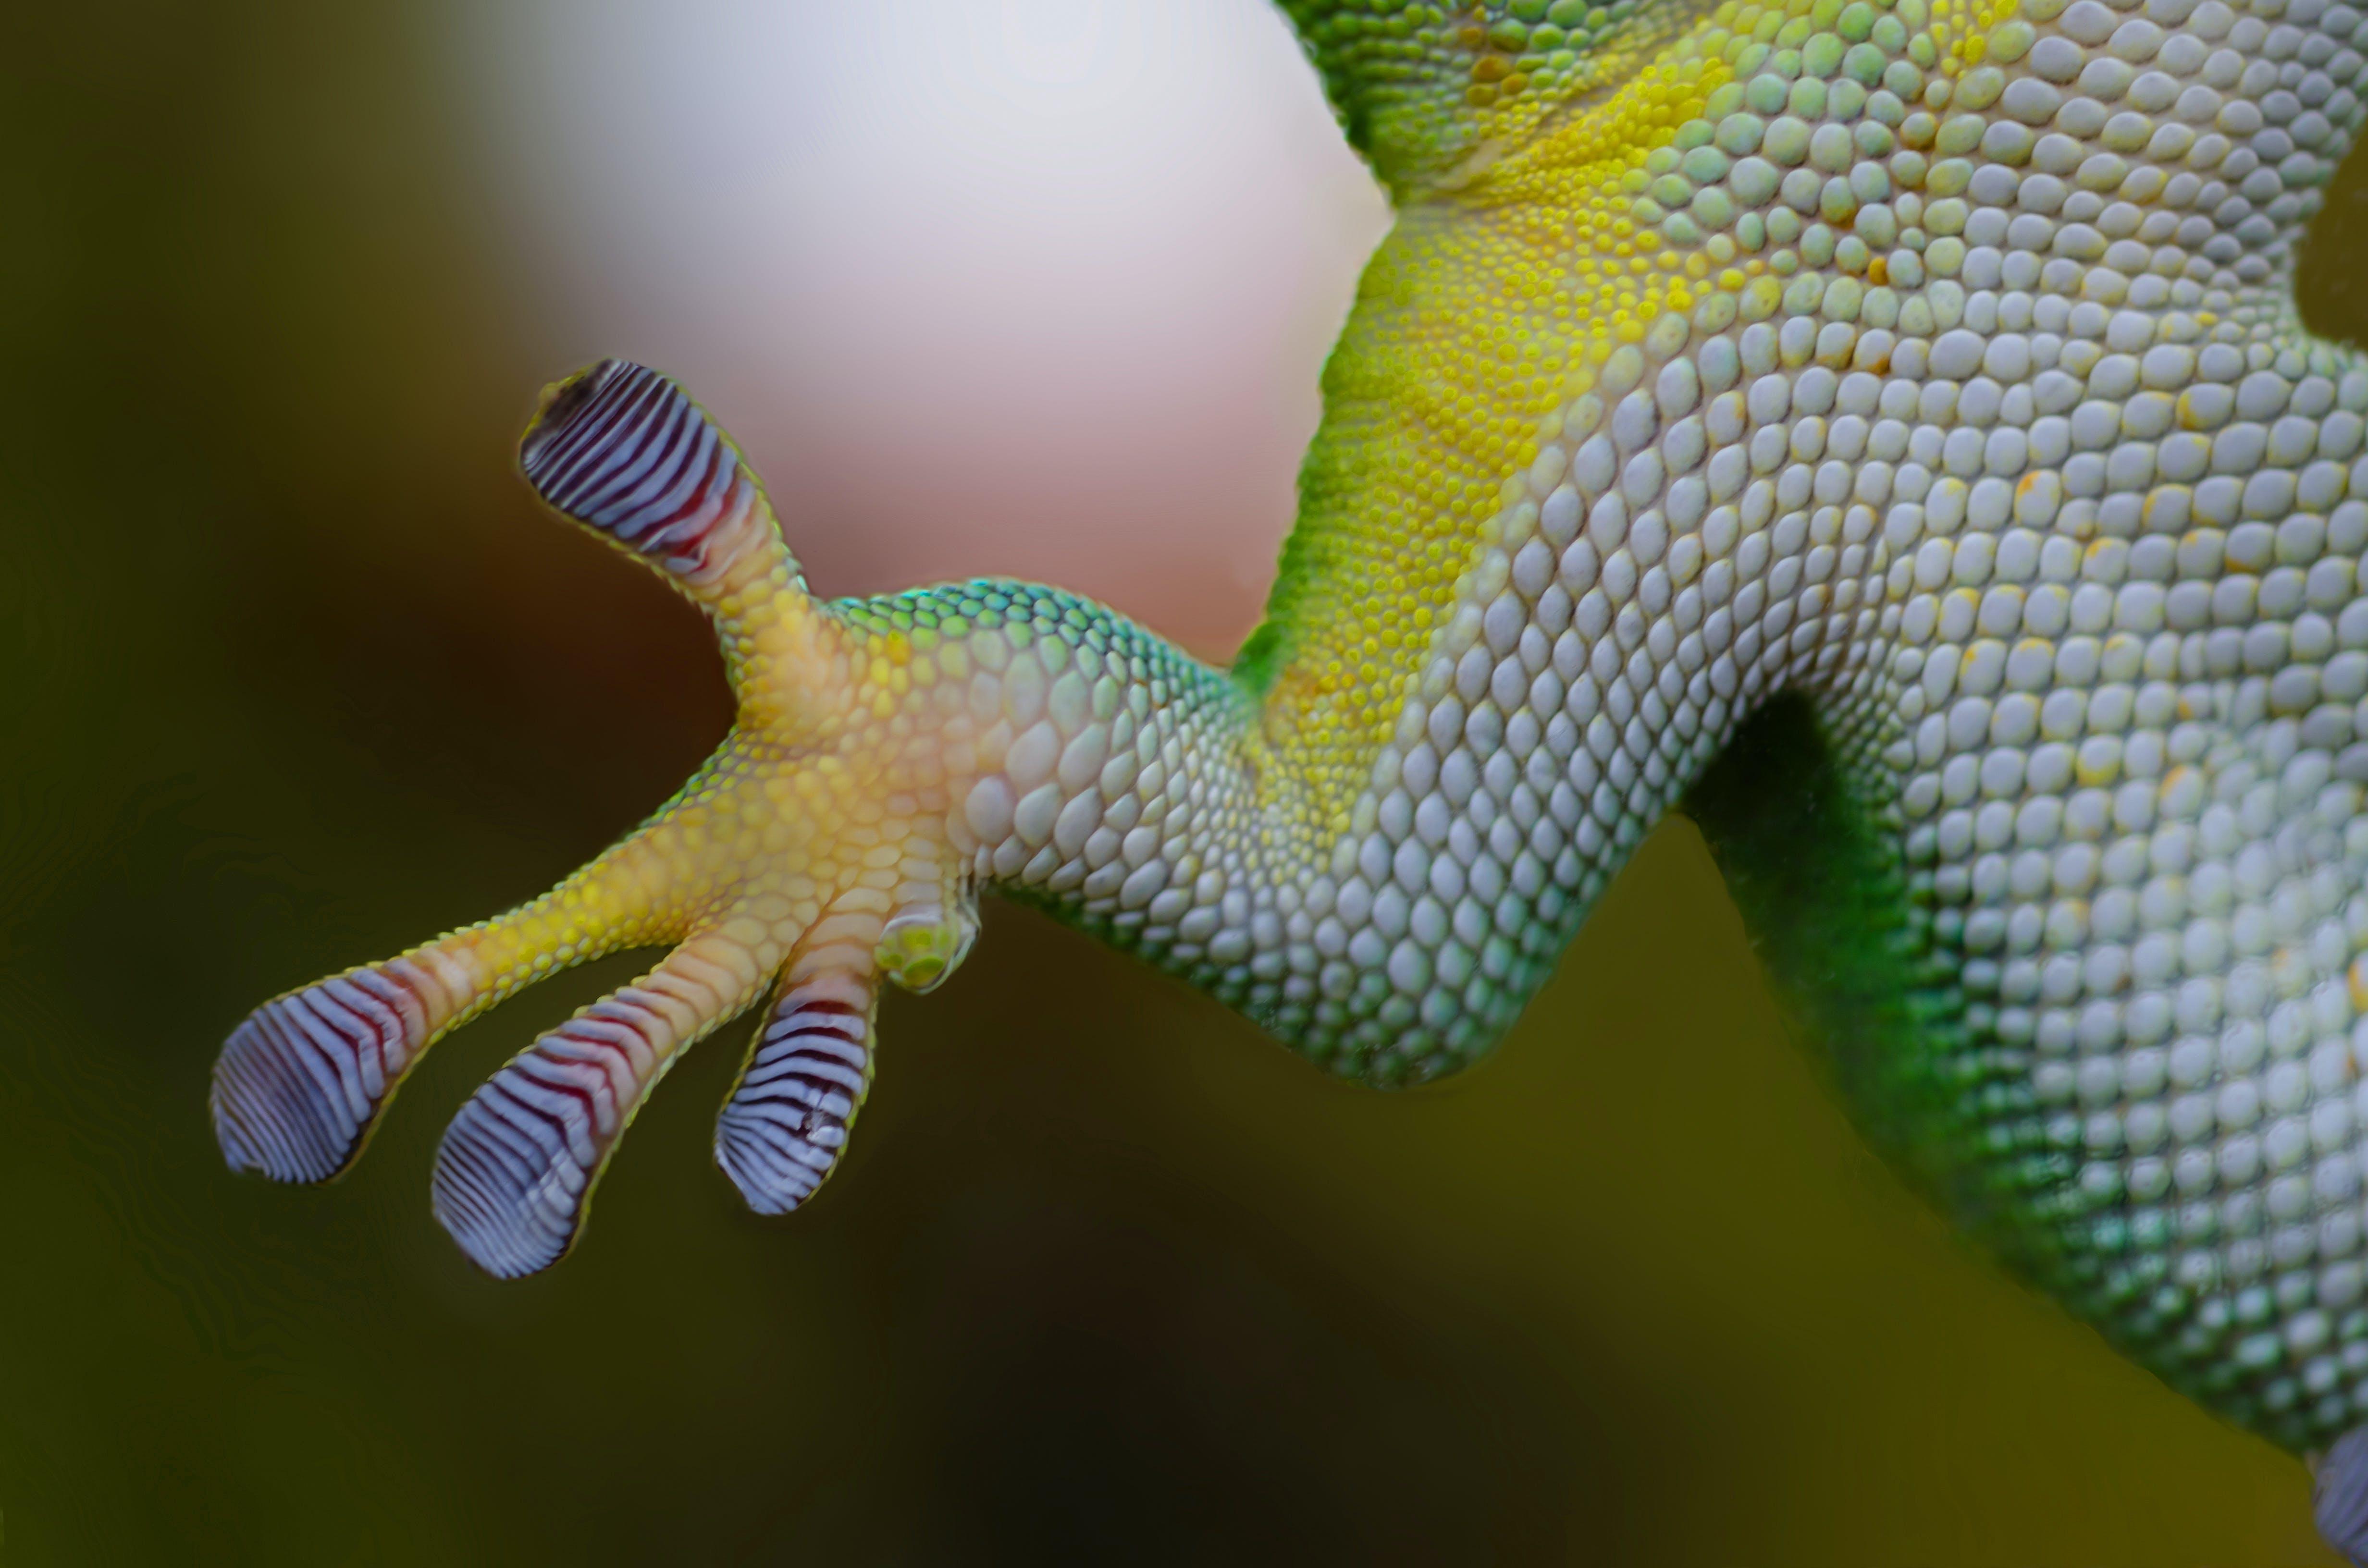 Free stock photo of animal, glass, green, lizard